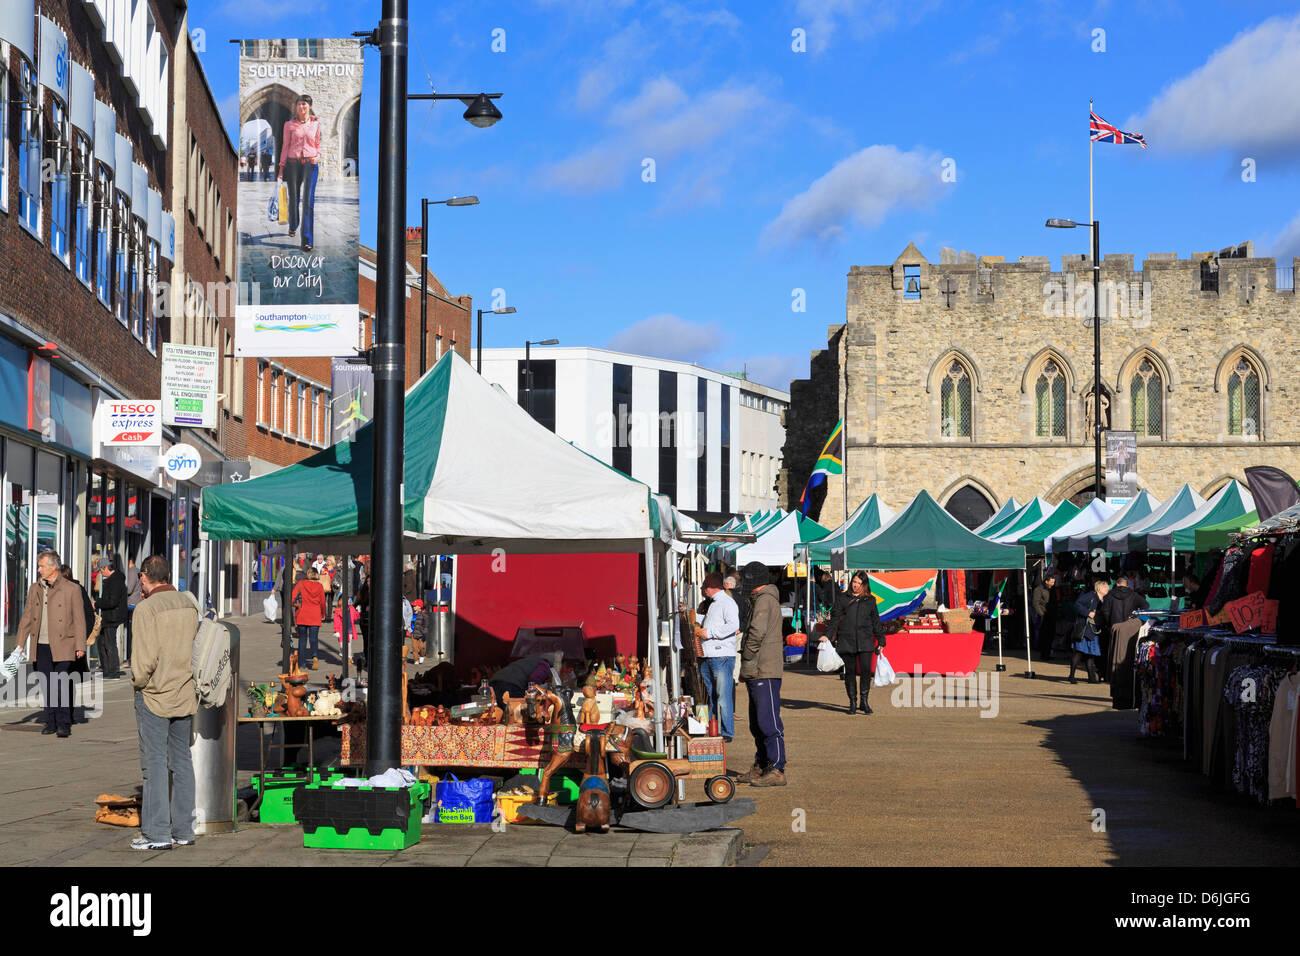 Saturday Market on High Street, Southampton, Hampshire, England, United Kingdom, Europe - Stock Image